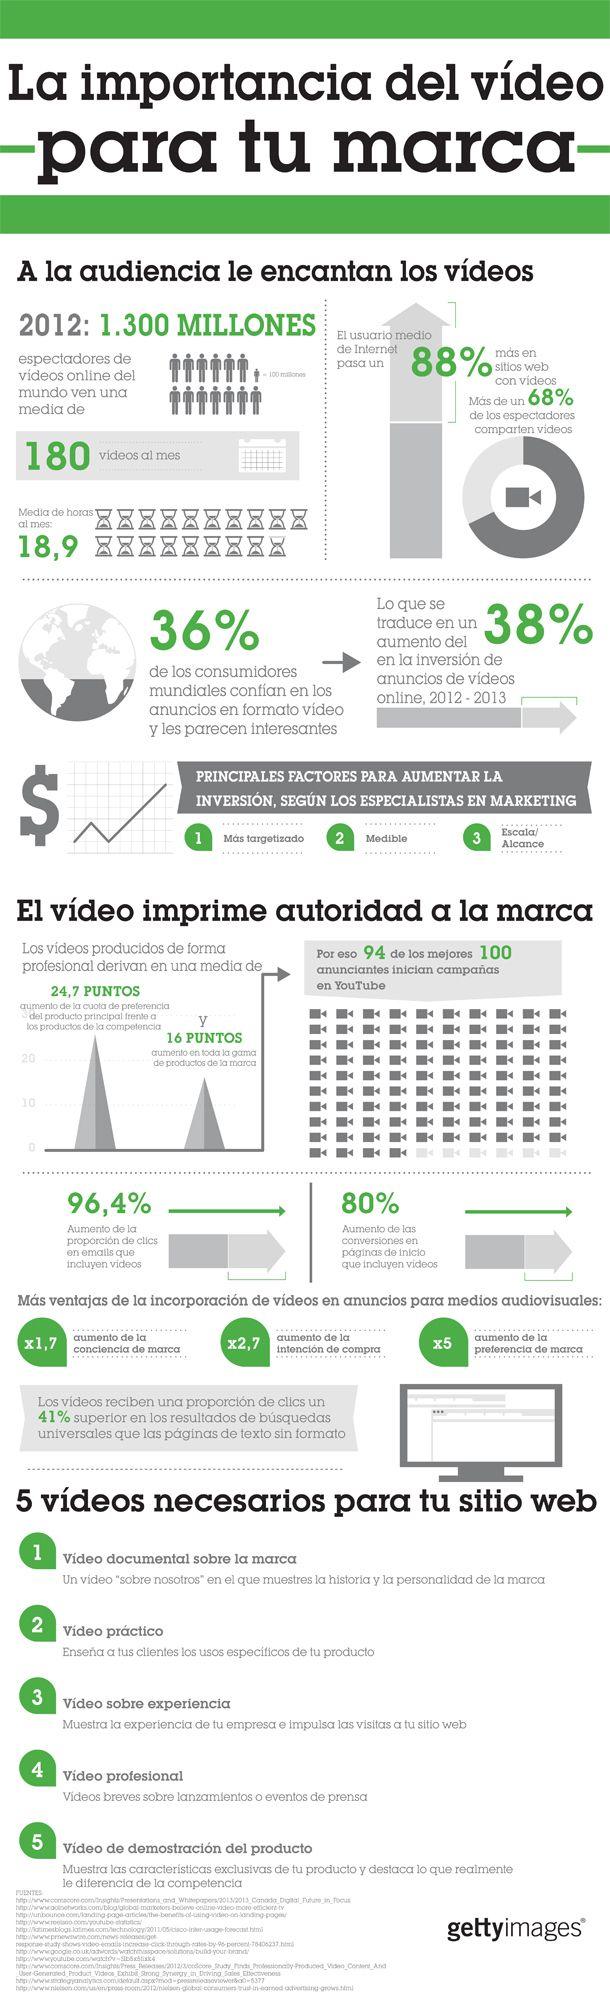 La importancia del vídeo para tu marca #infografia #infographic #marketing